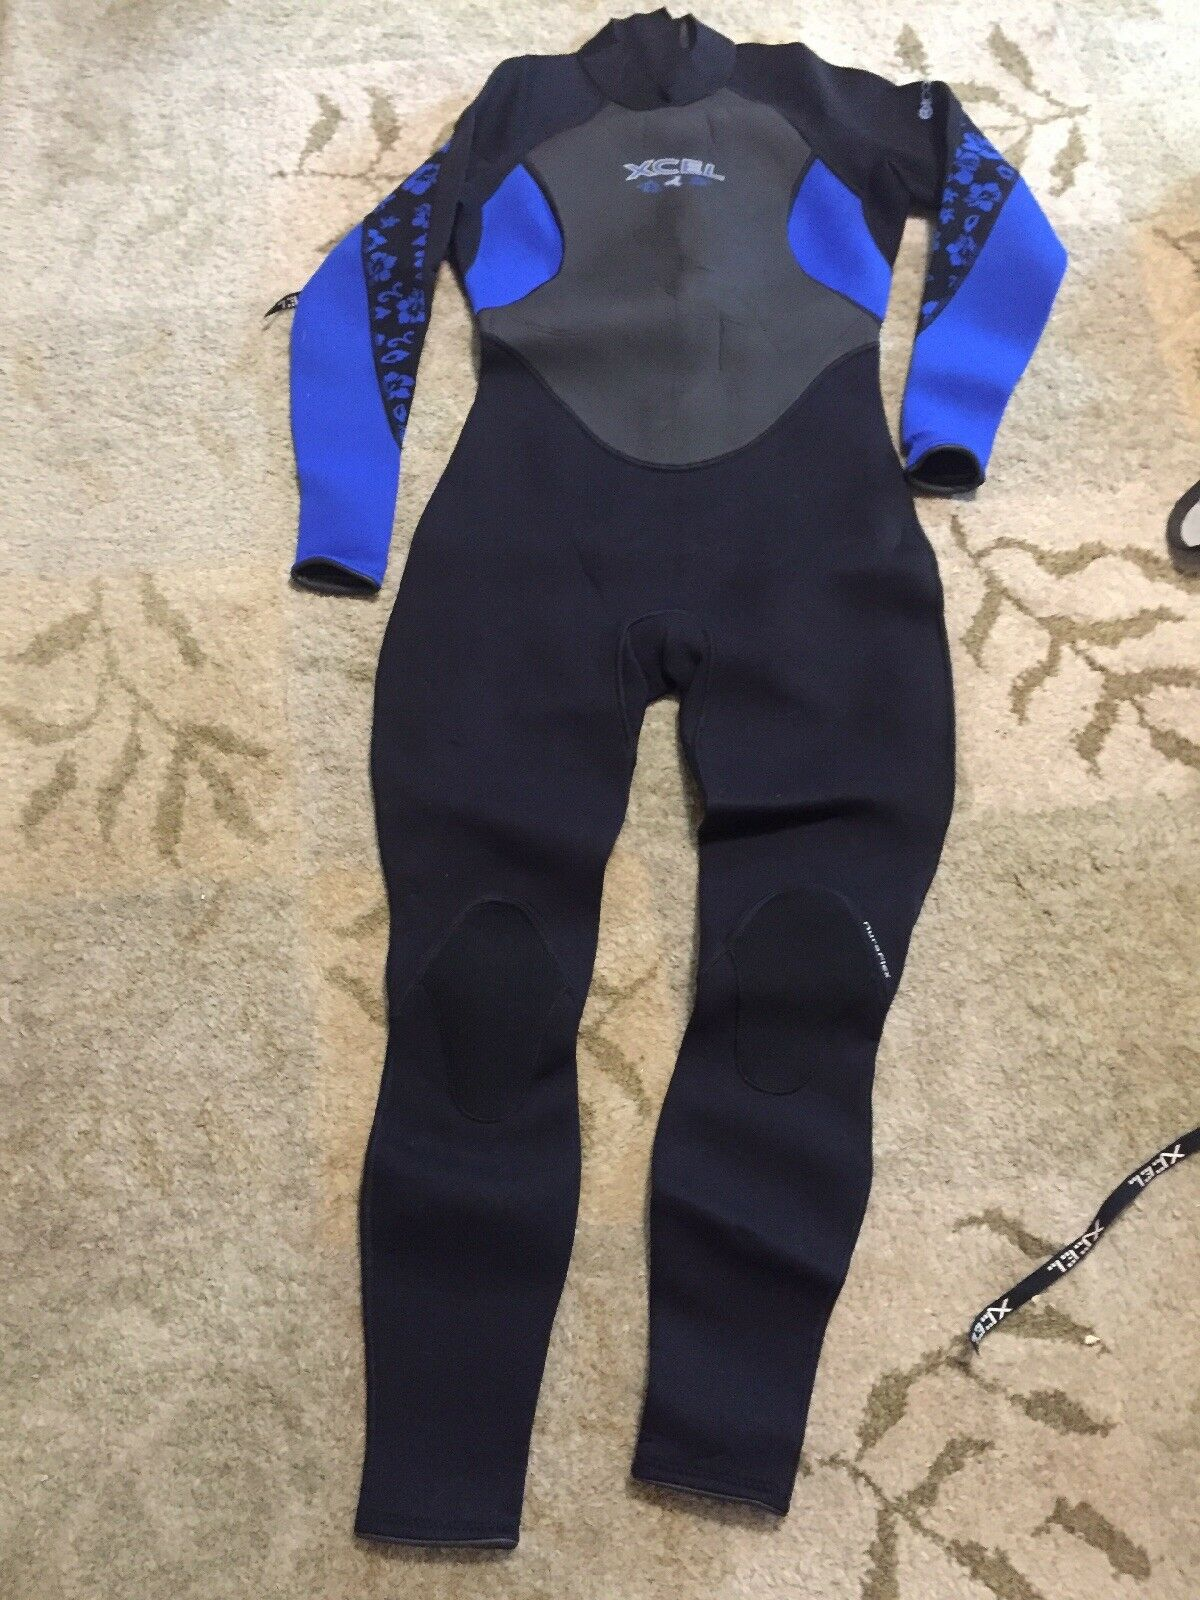 Xcel Hawaii  Full Wetsuit Superlite 3.2 Size 12  on sale 70% off